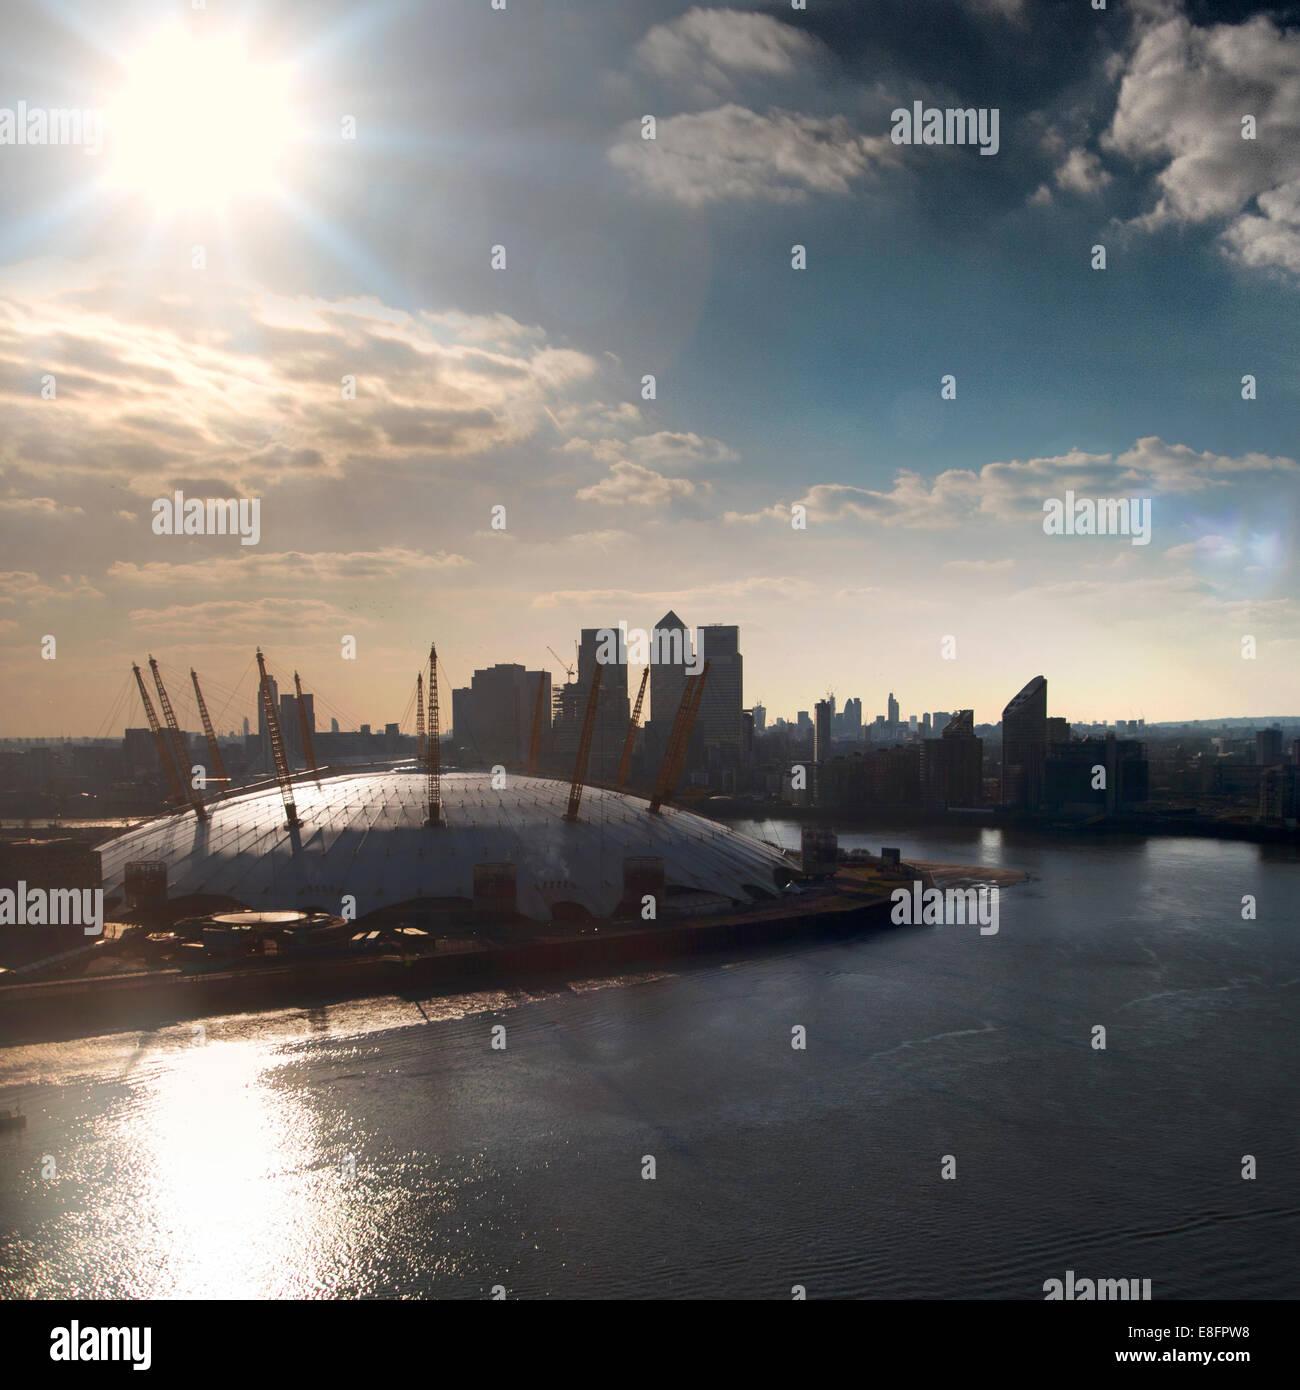 United Kingdom, London, View of O2 Arena - Stock Image